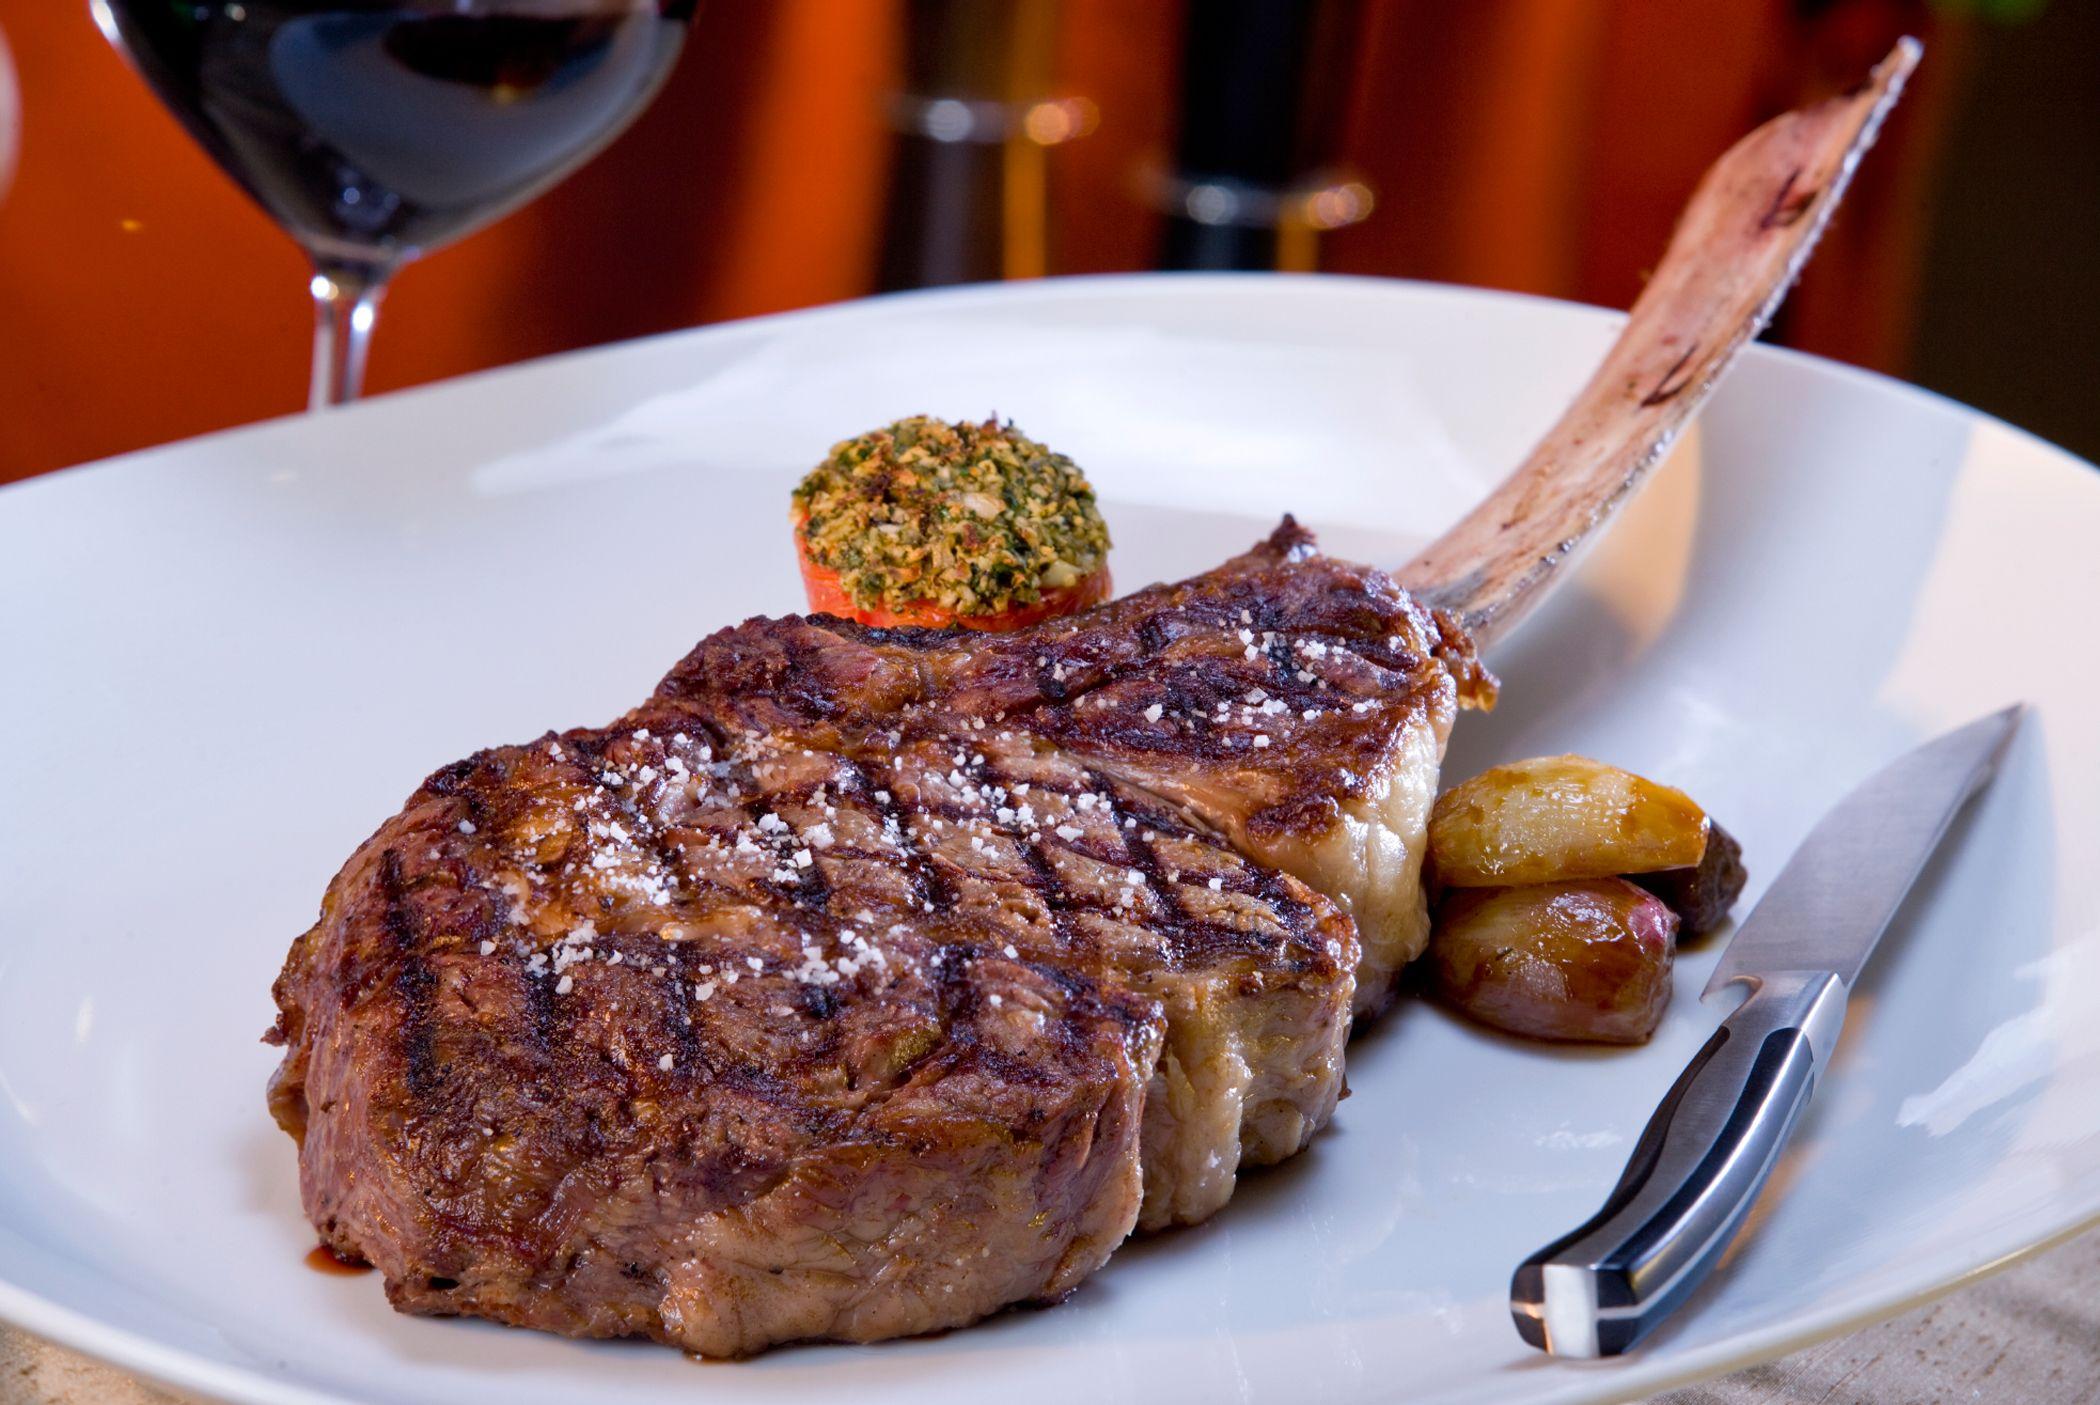 Best Steak And Lobster In Long Beach